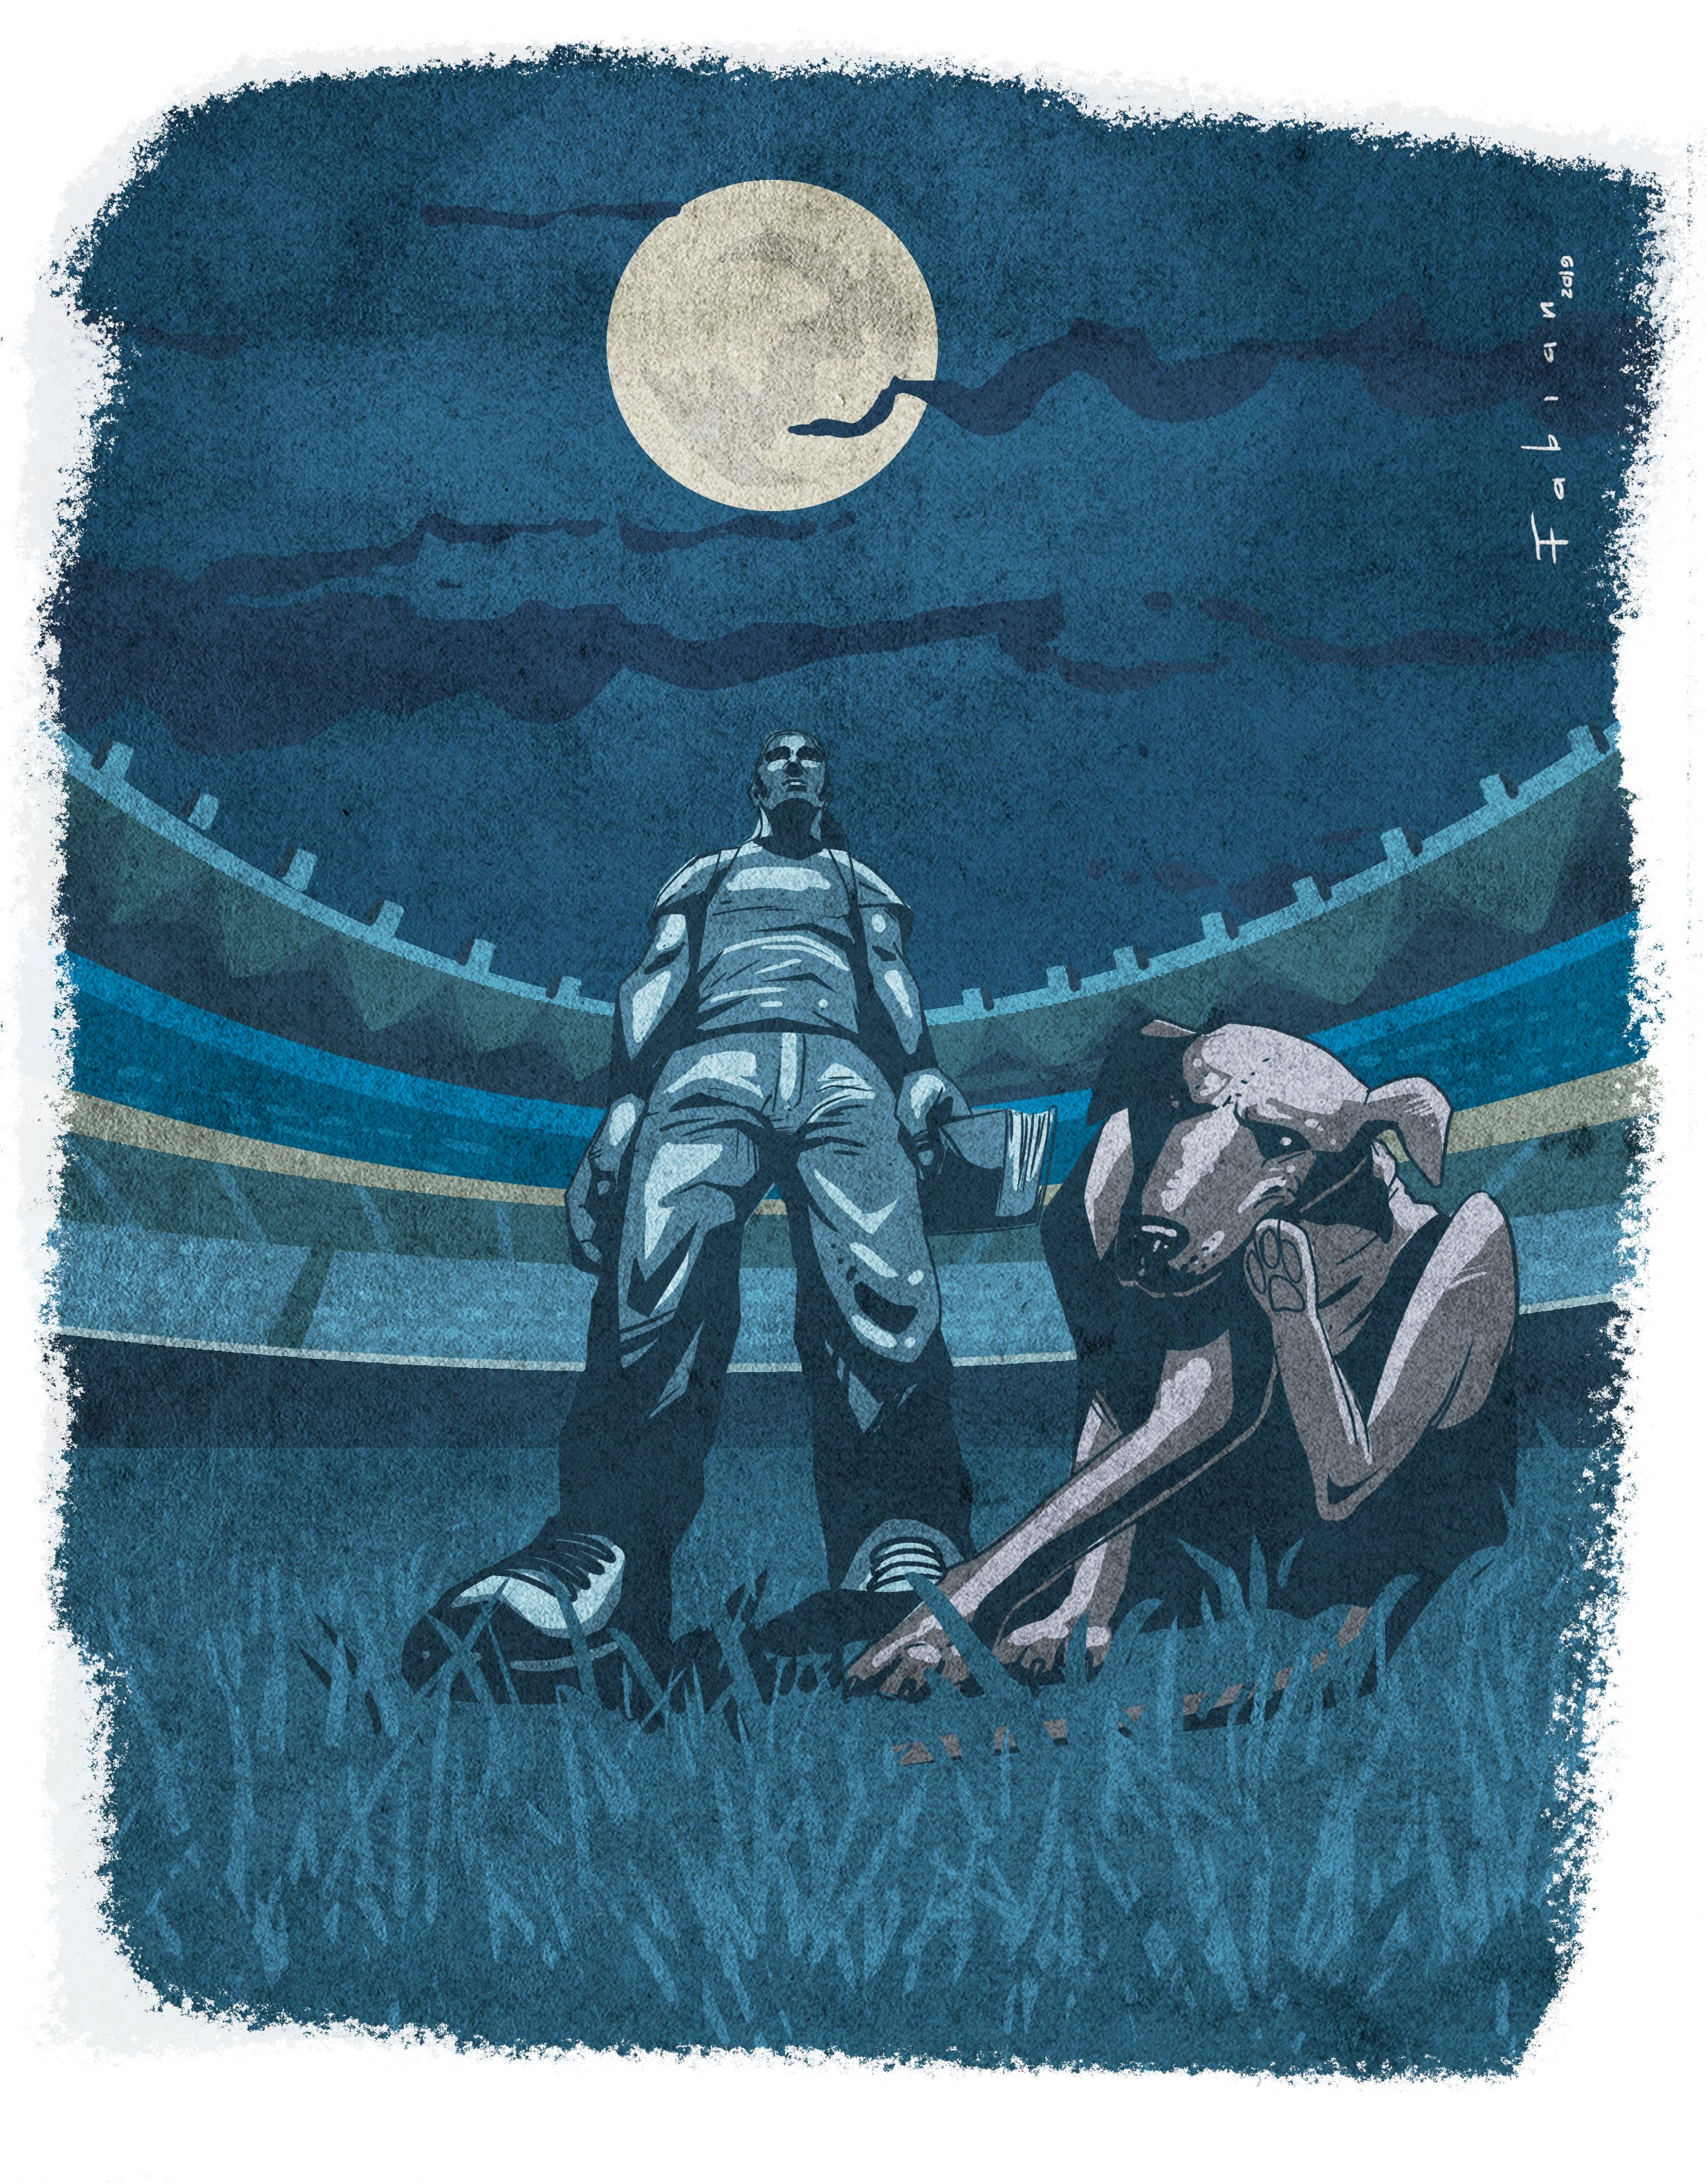 Ilustración por Héctor Fabián Rodríguez